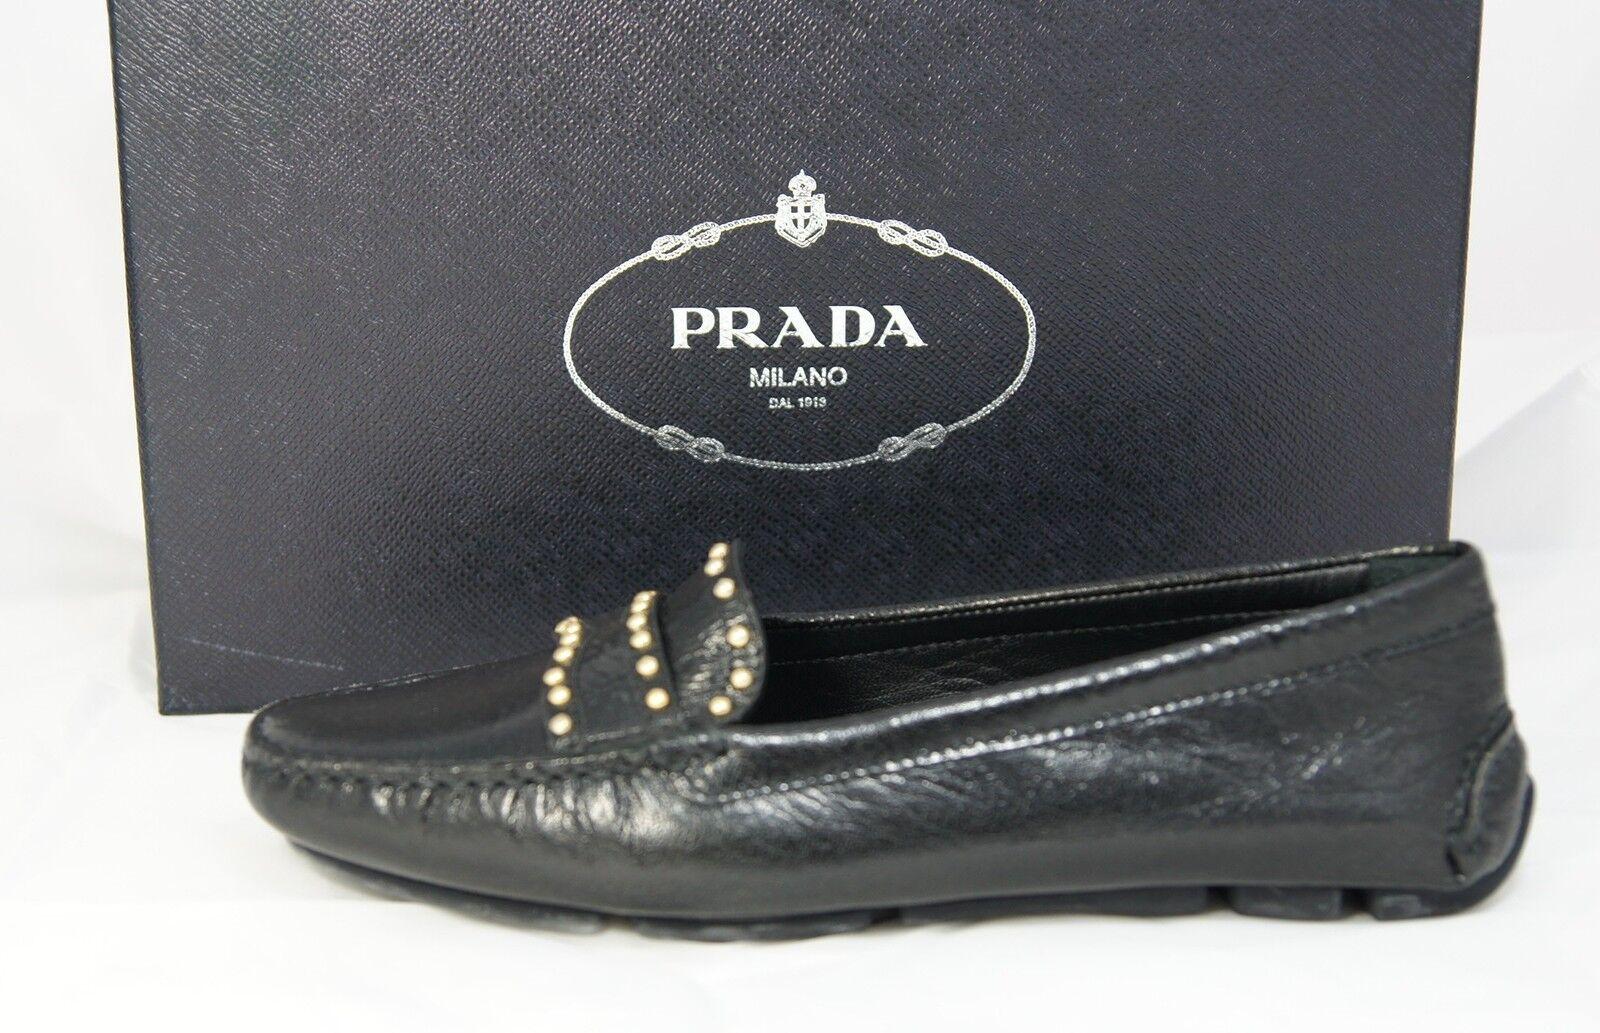 PRADA Gr 36,5 Halbschuhe Slipper Mokassins Loafers Schuhe schwarz neu